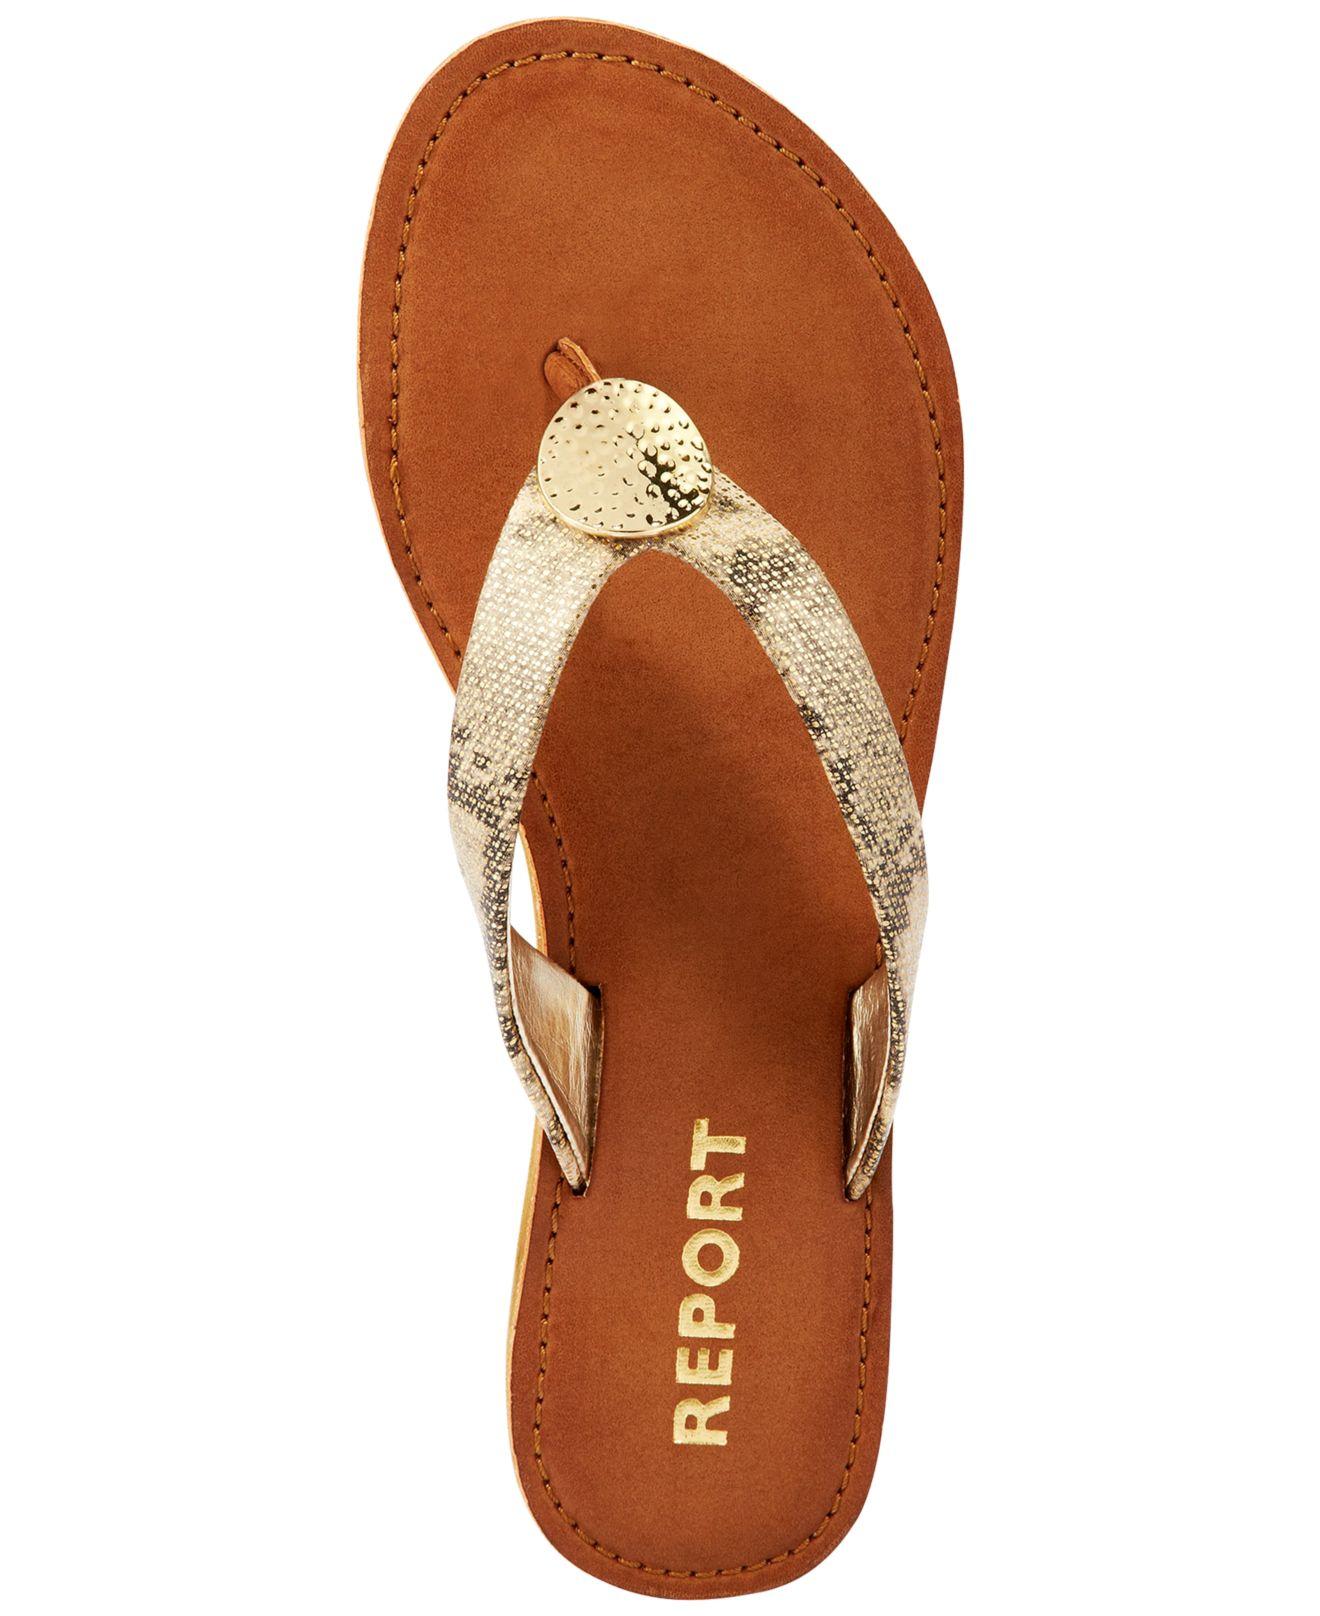 12e518294e81 Lyst - Report Shields Flat Thong Sandals in Metallic